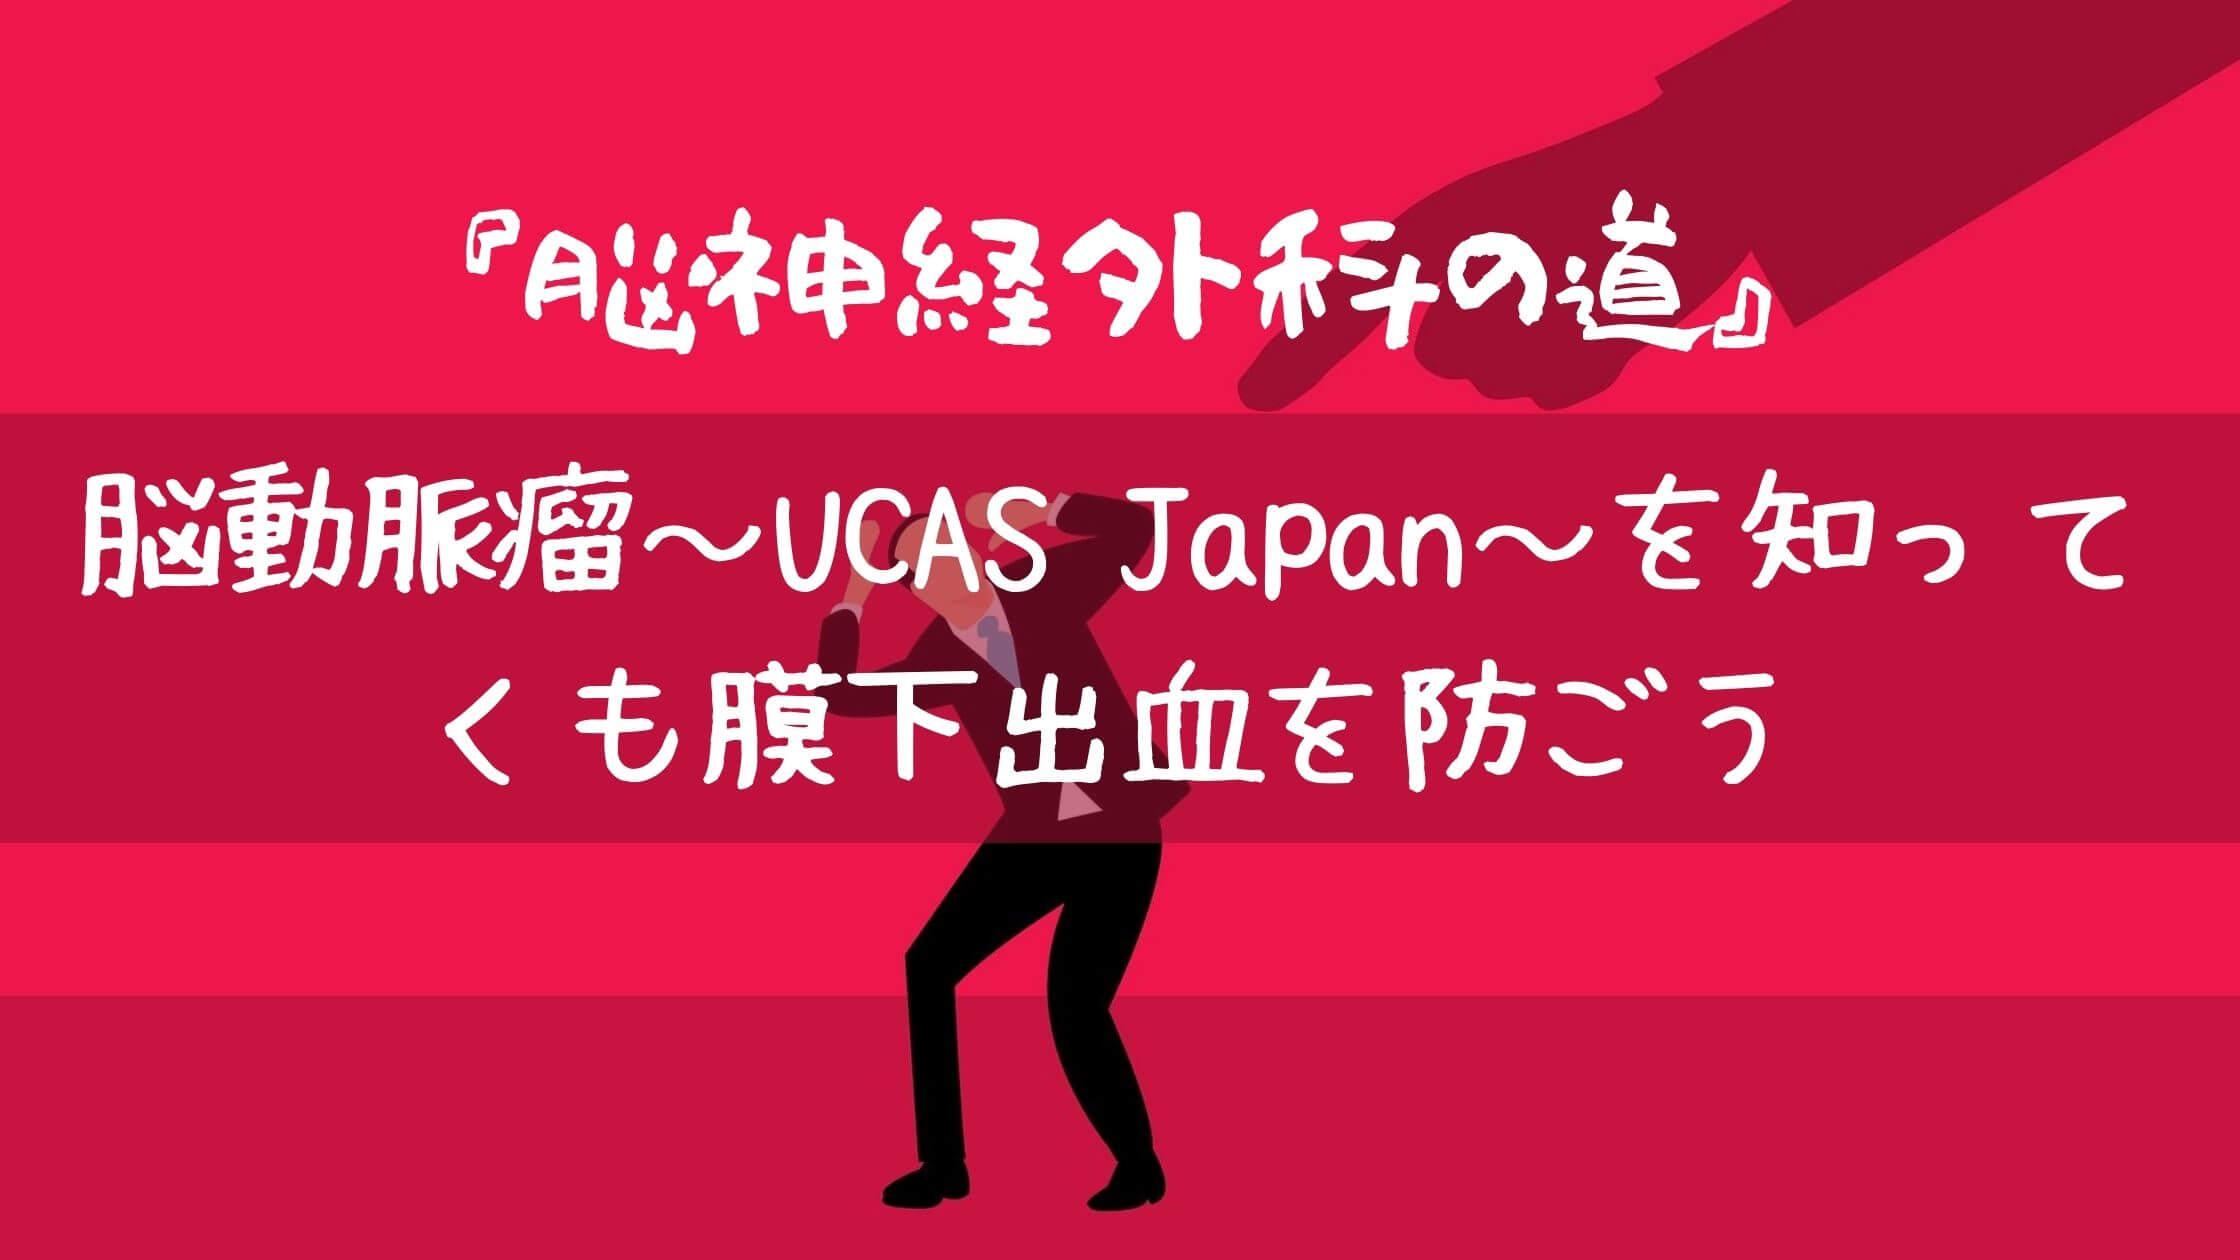 UCAS Japan-A1